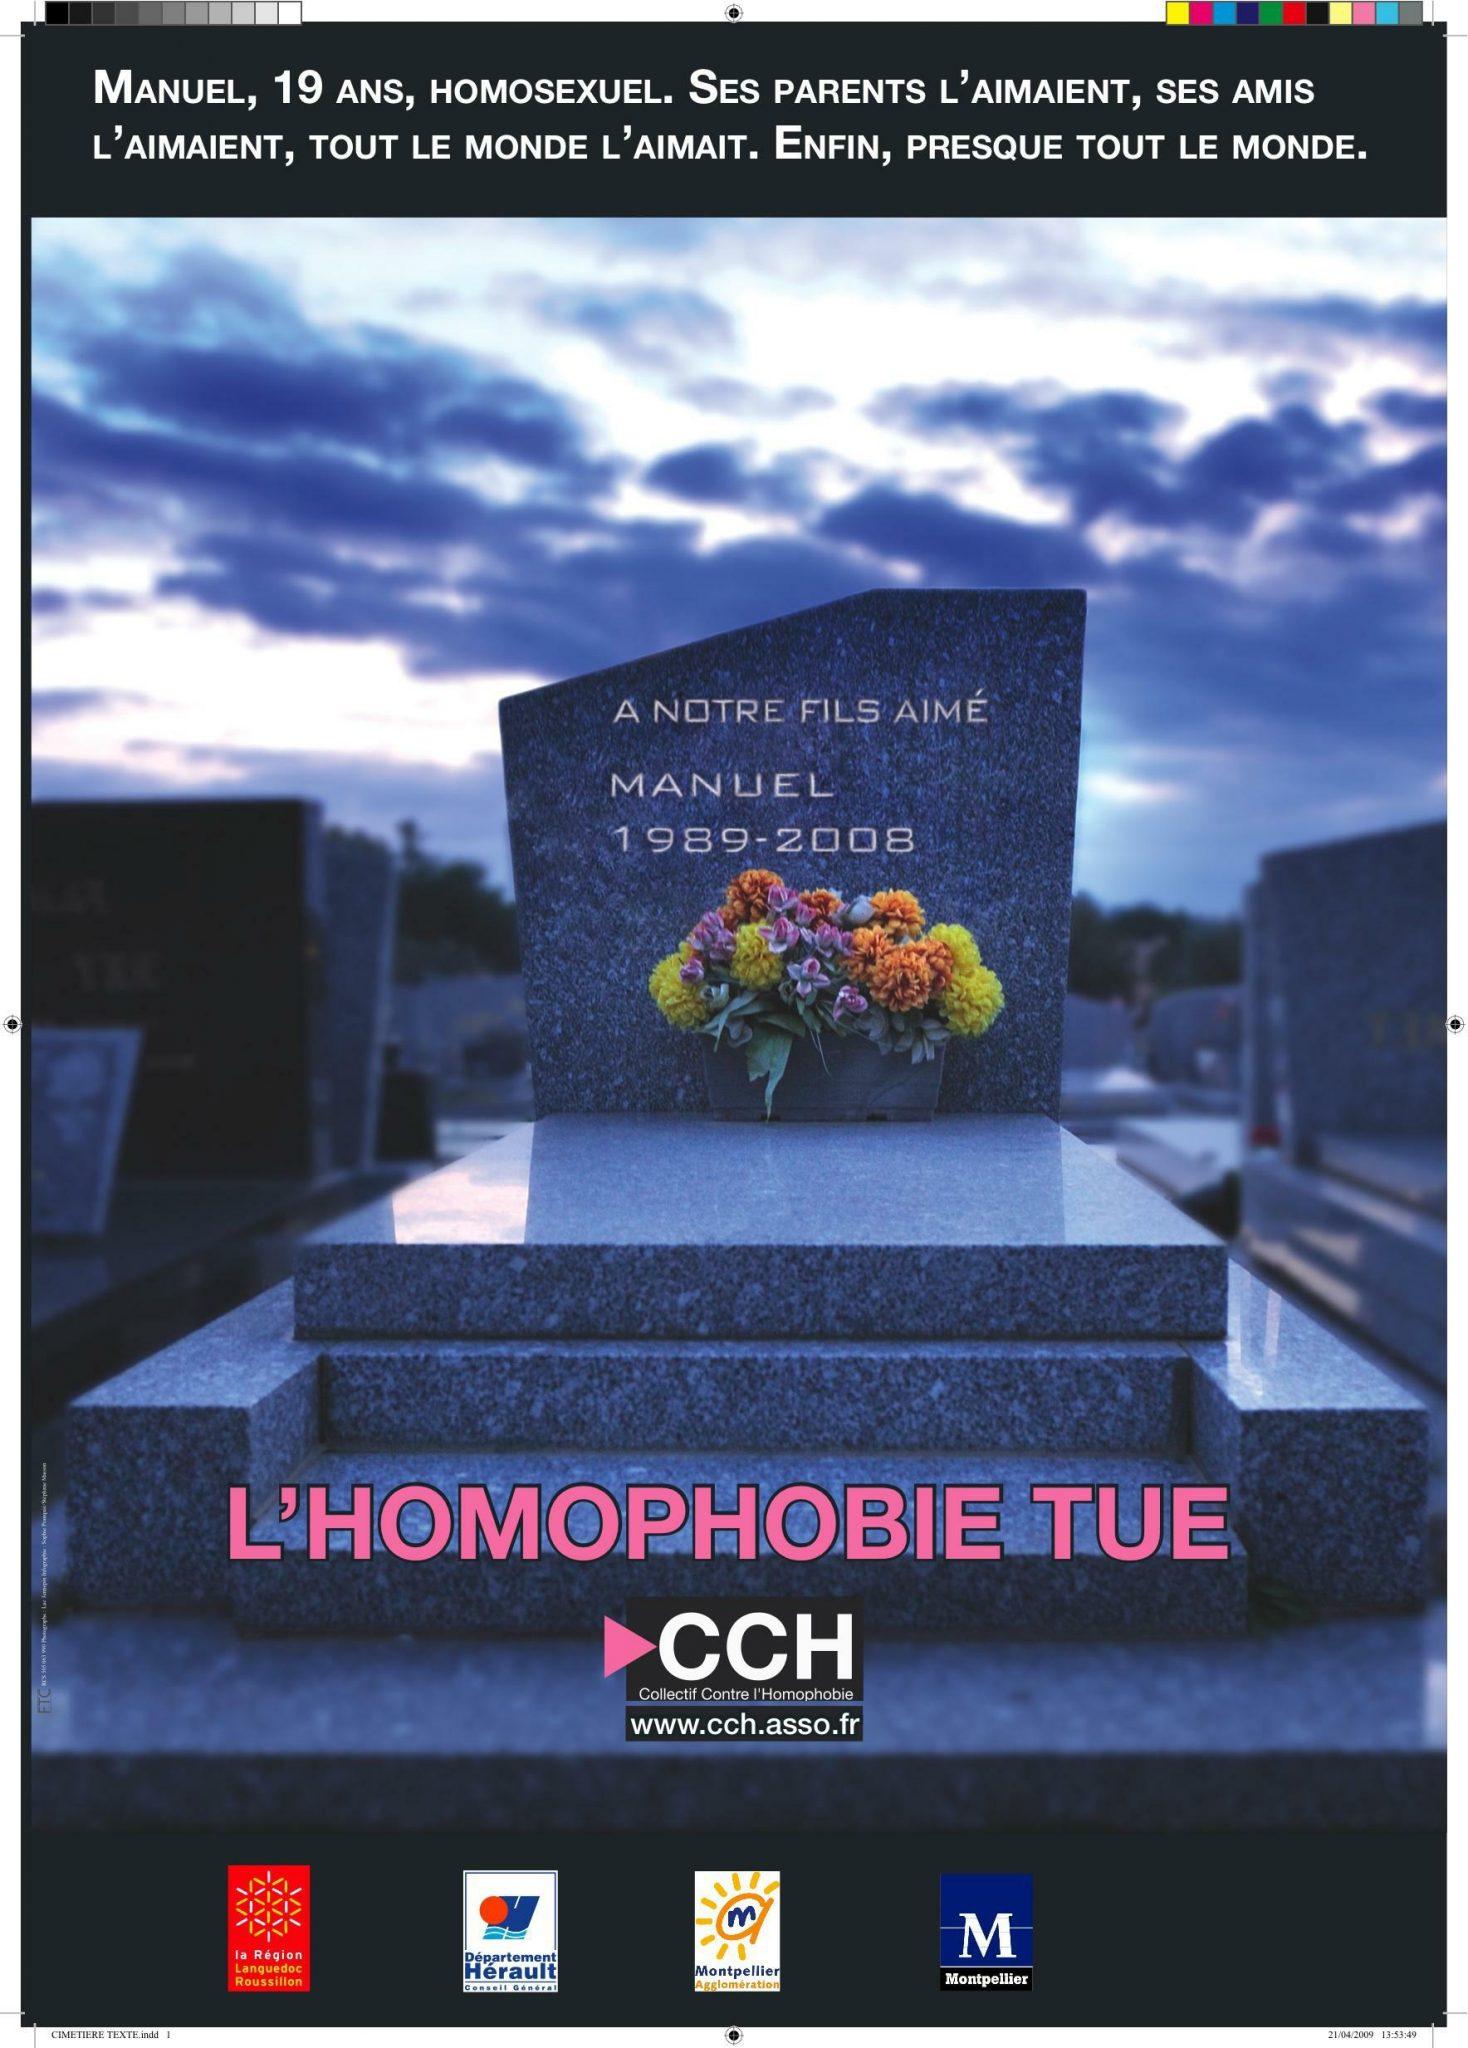 l'homophobie tue - Homophobie tötet (c) CCH